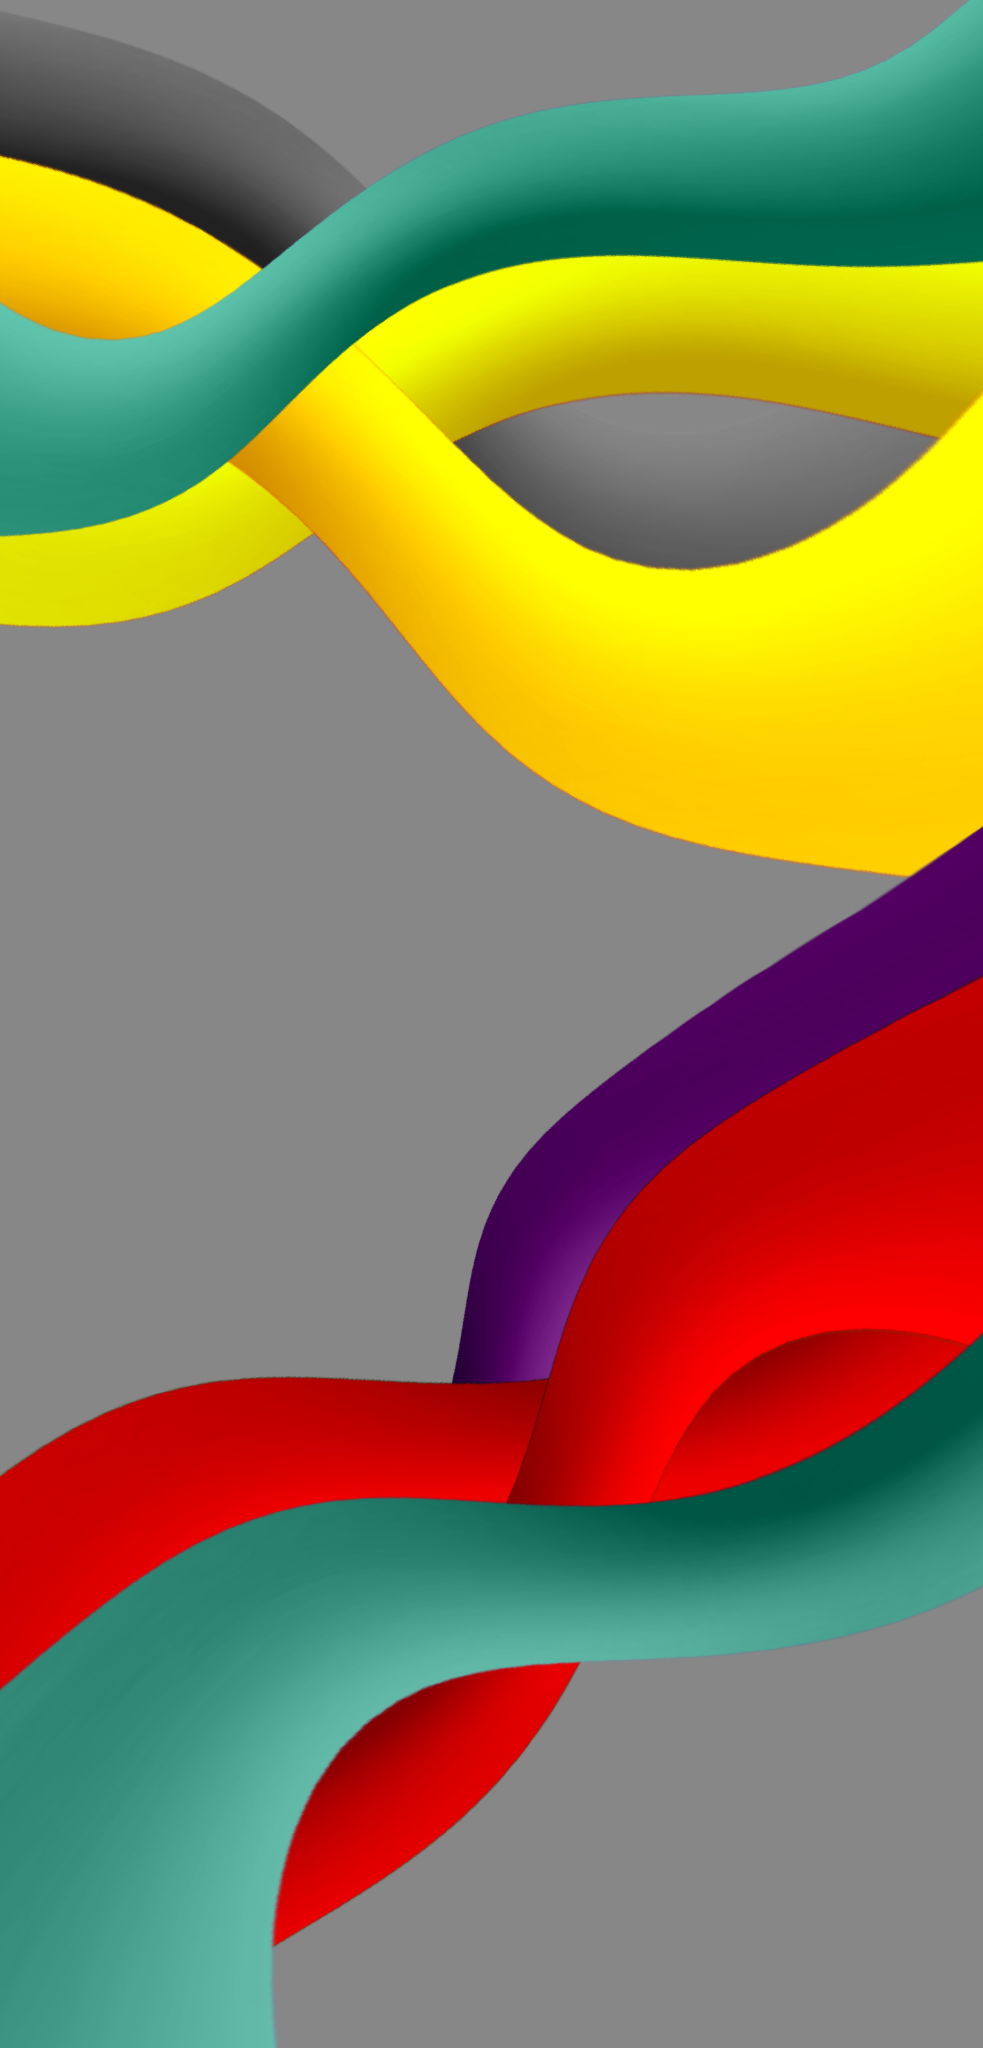 Pin by Satishjain JainS.C on Art abstract in 2020